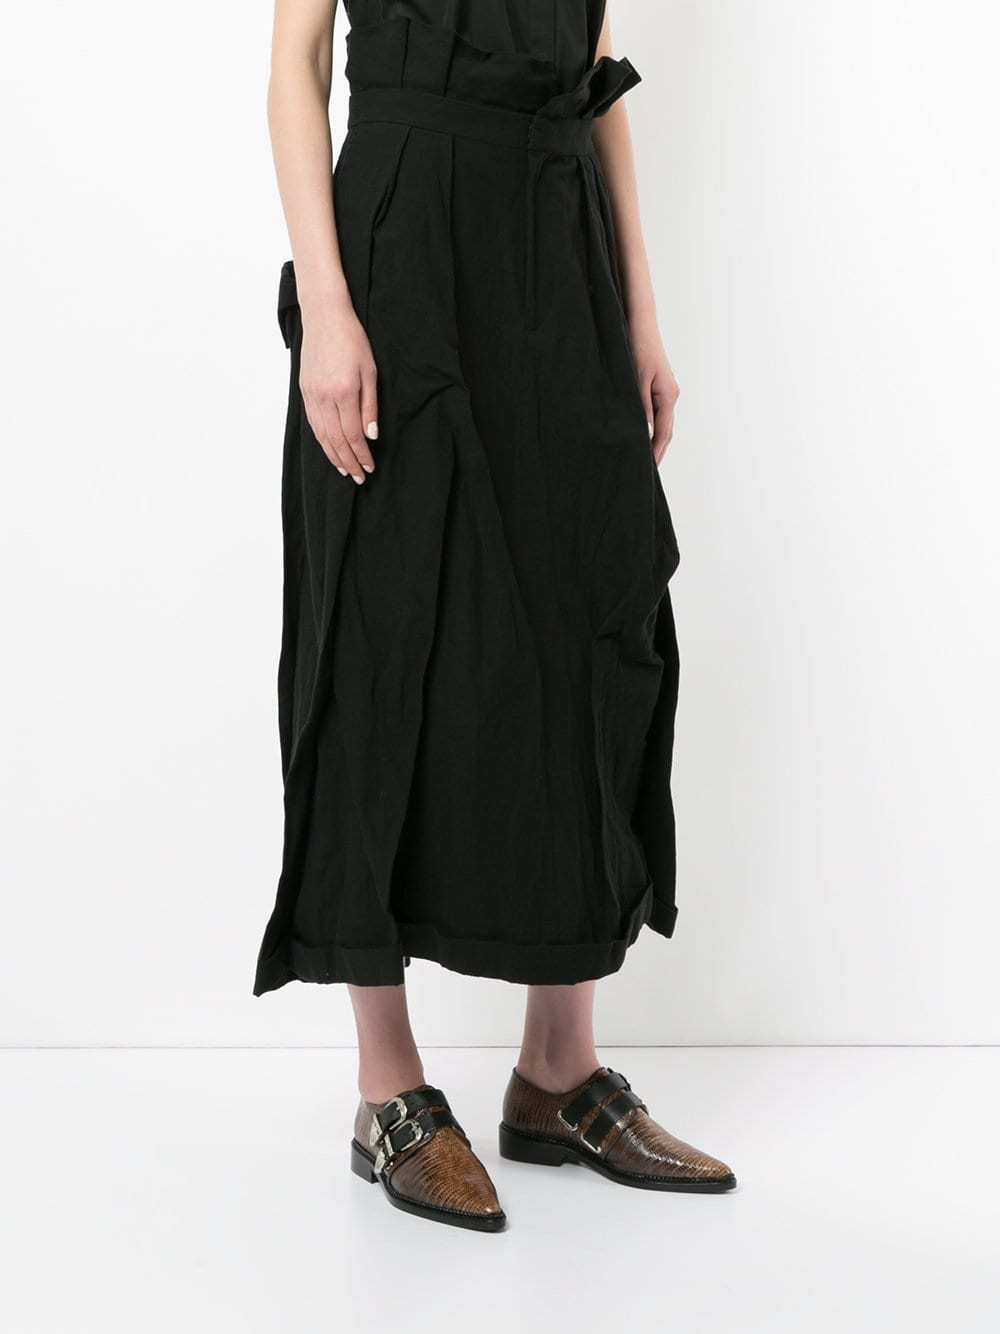 ac6b1385d2 Long Pleated Maxi Skirt Uk – DACC